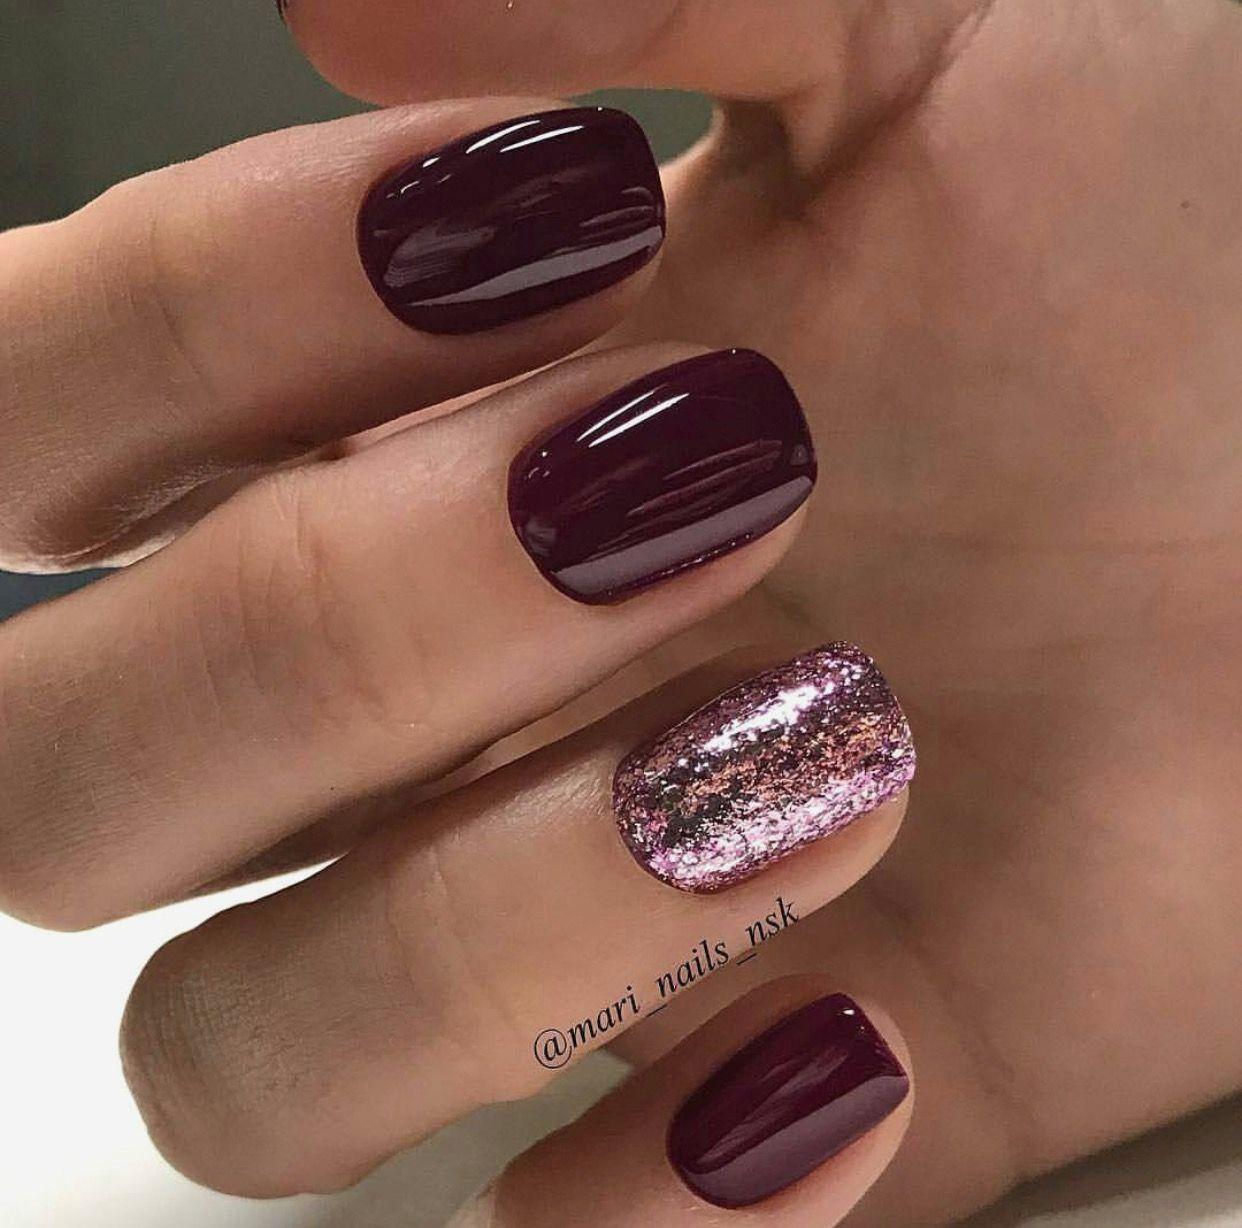 Toe Nail Color Trends 2018 My Blog Wine Nails Nails Short Nail Manicure